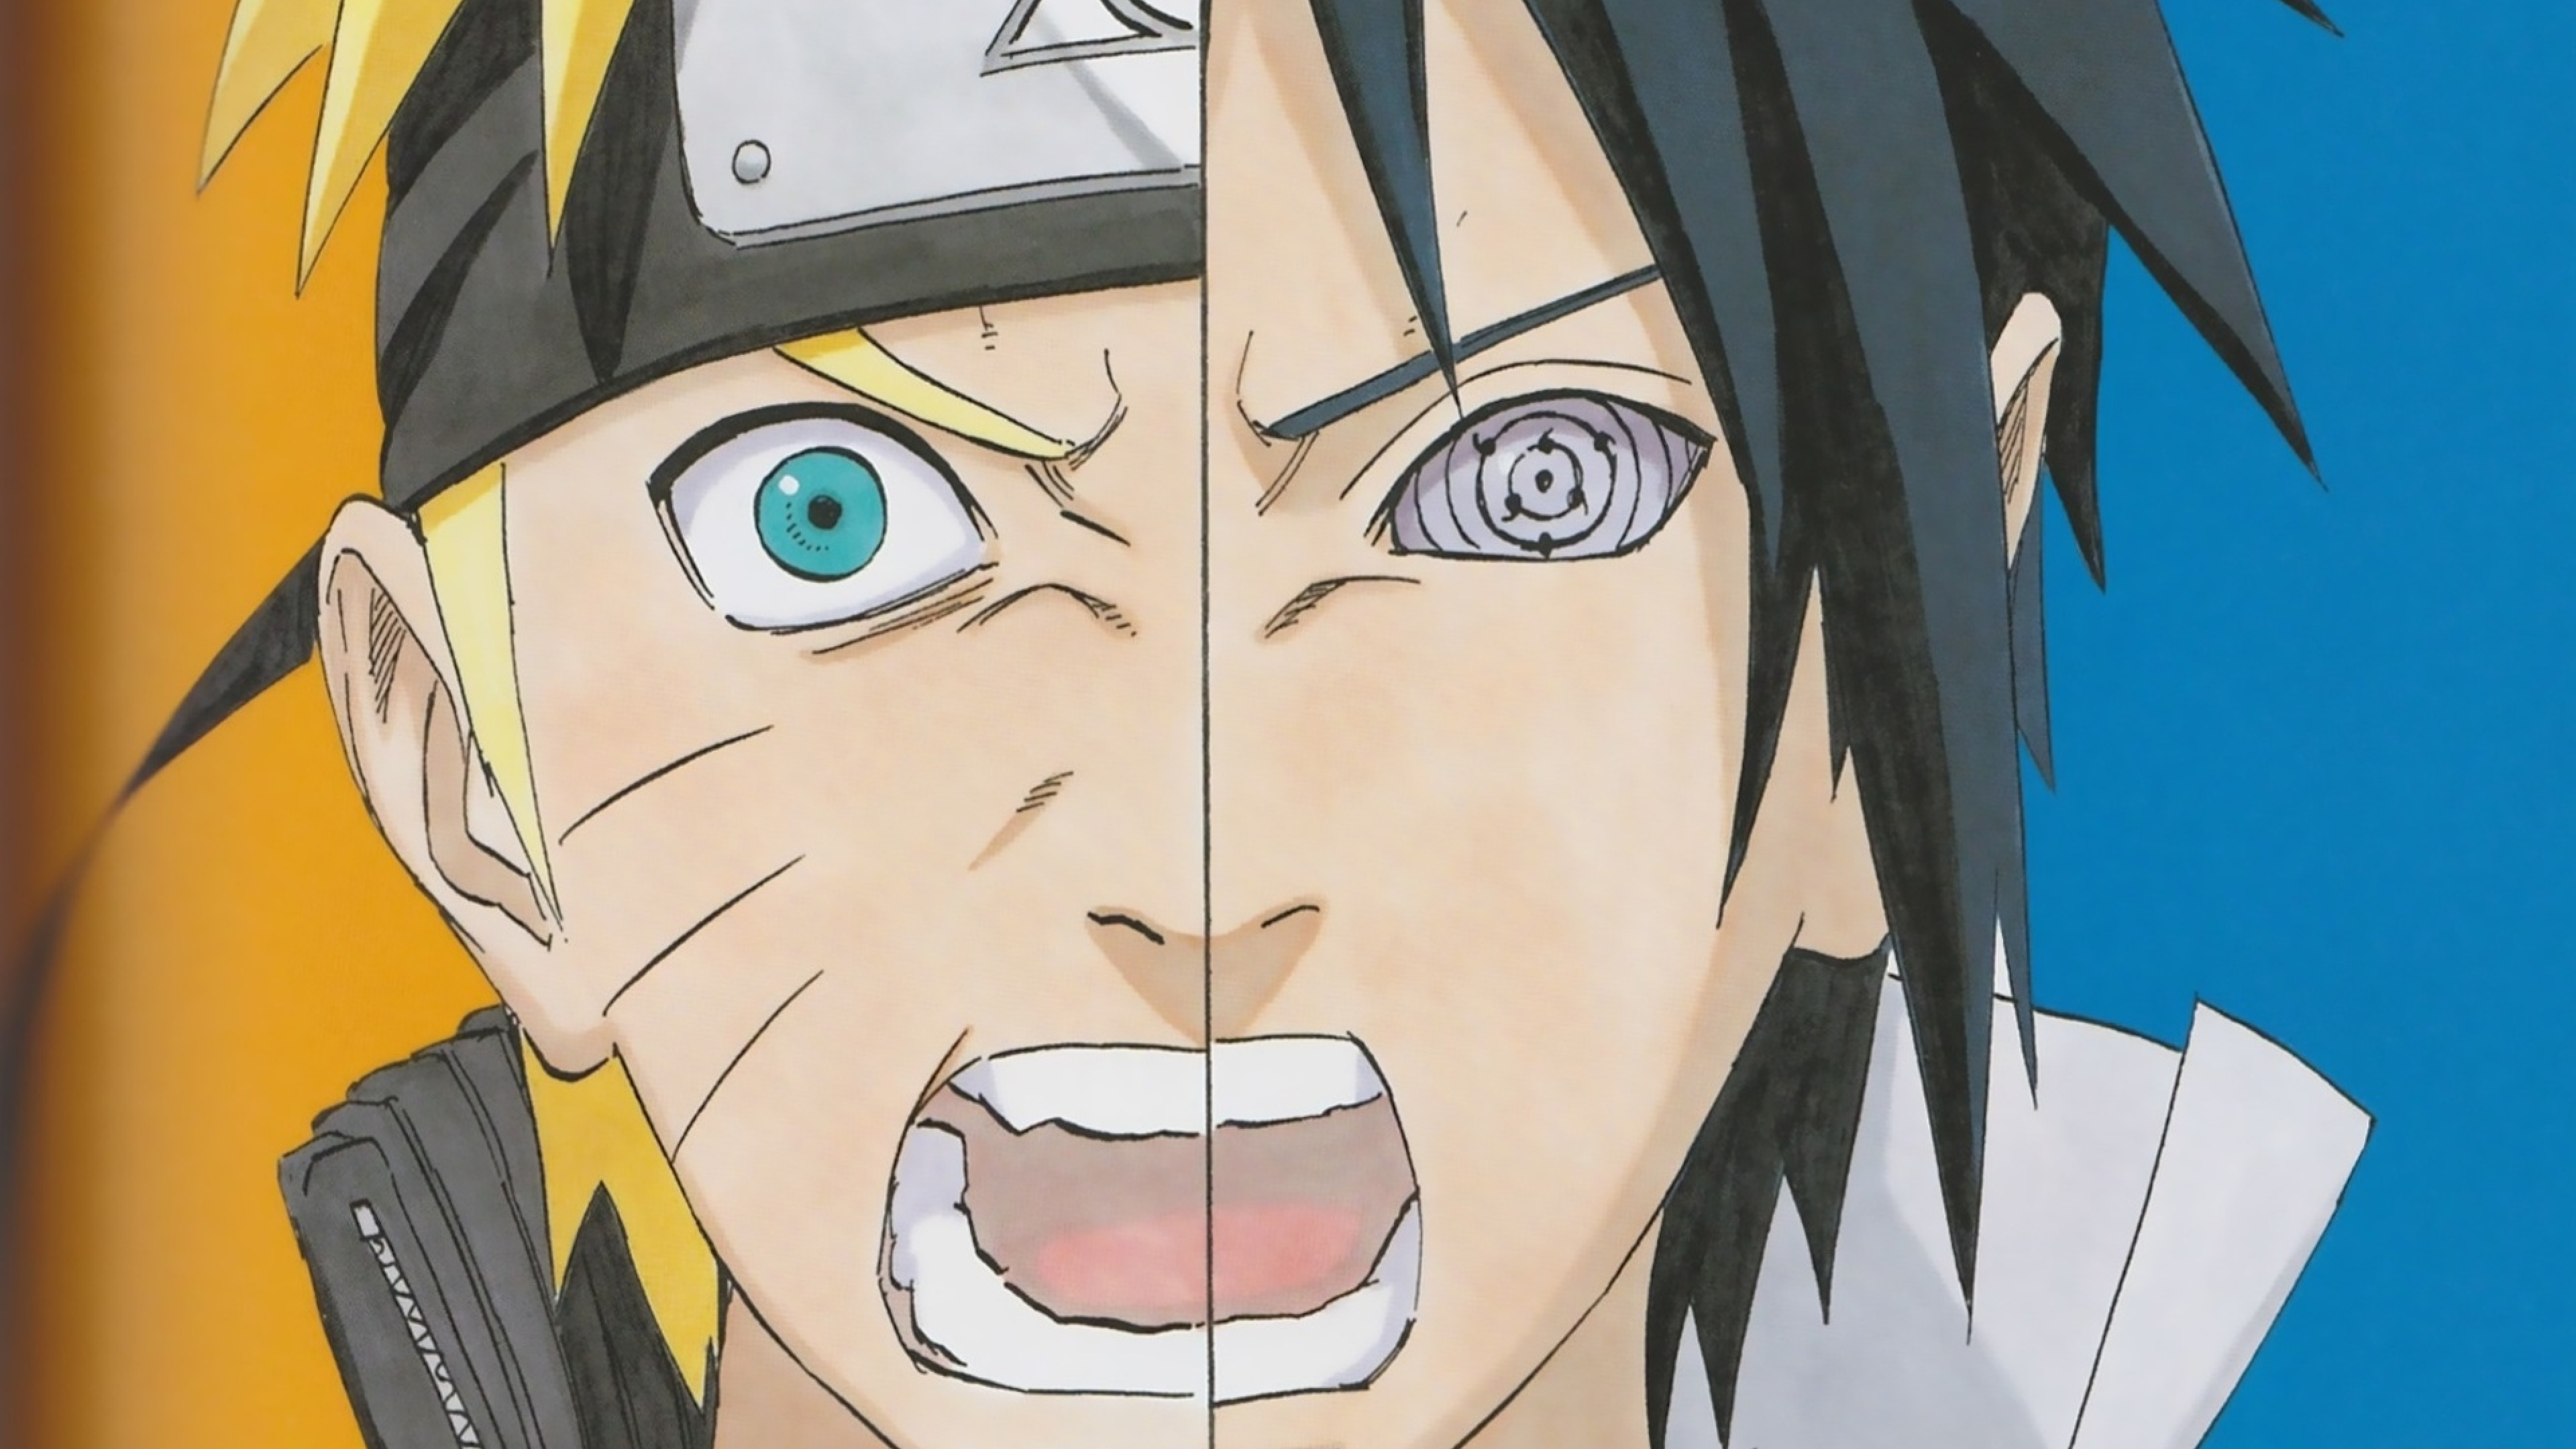 sasuke uchiha and naruto uzumaki bGVmamuUmZqaraWkpJRobWllrWdma2U